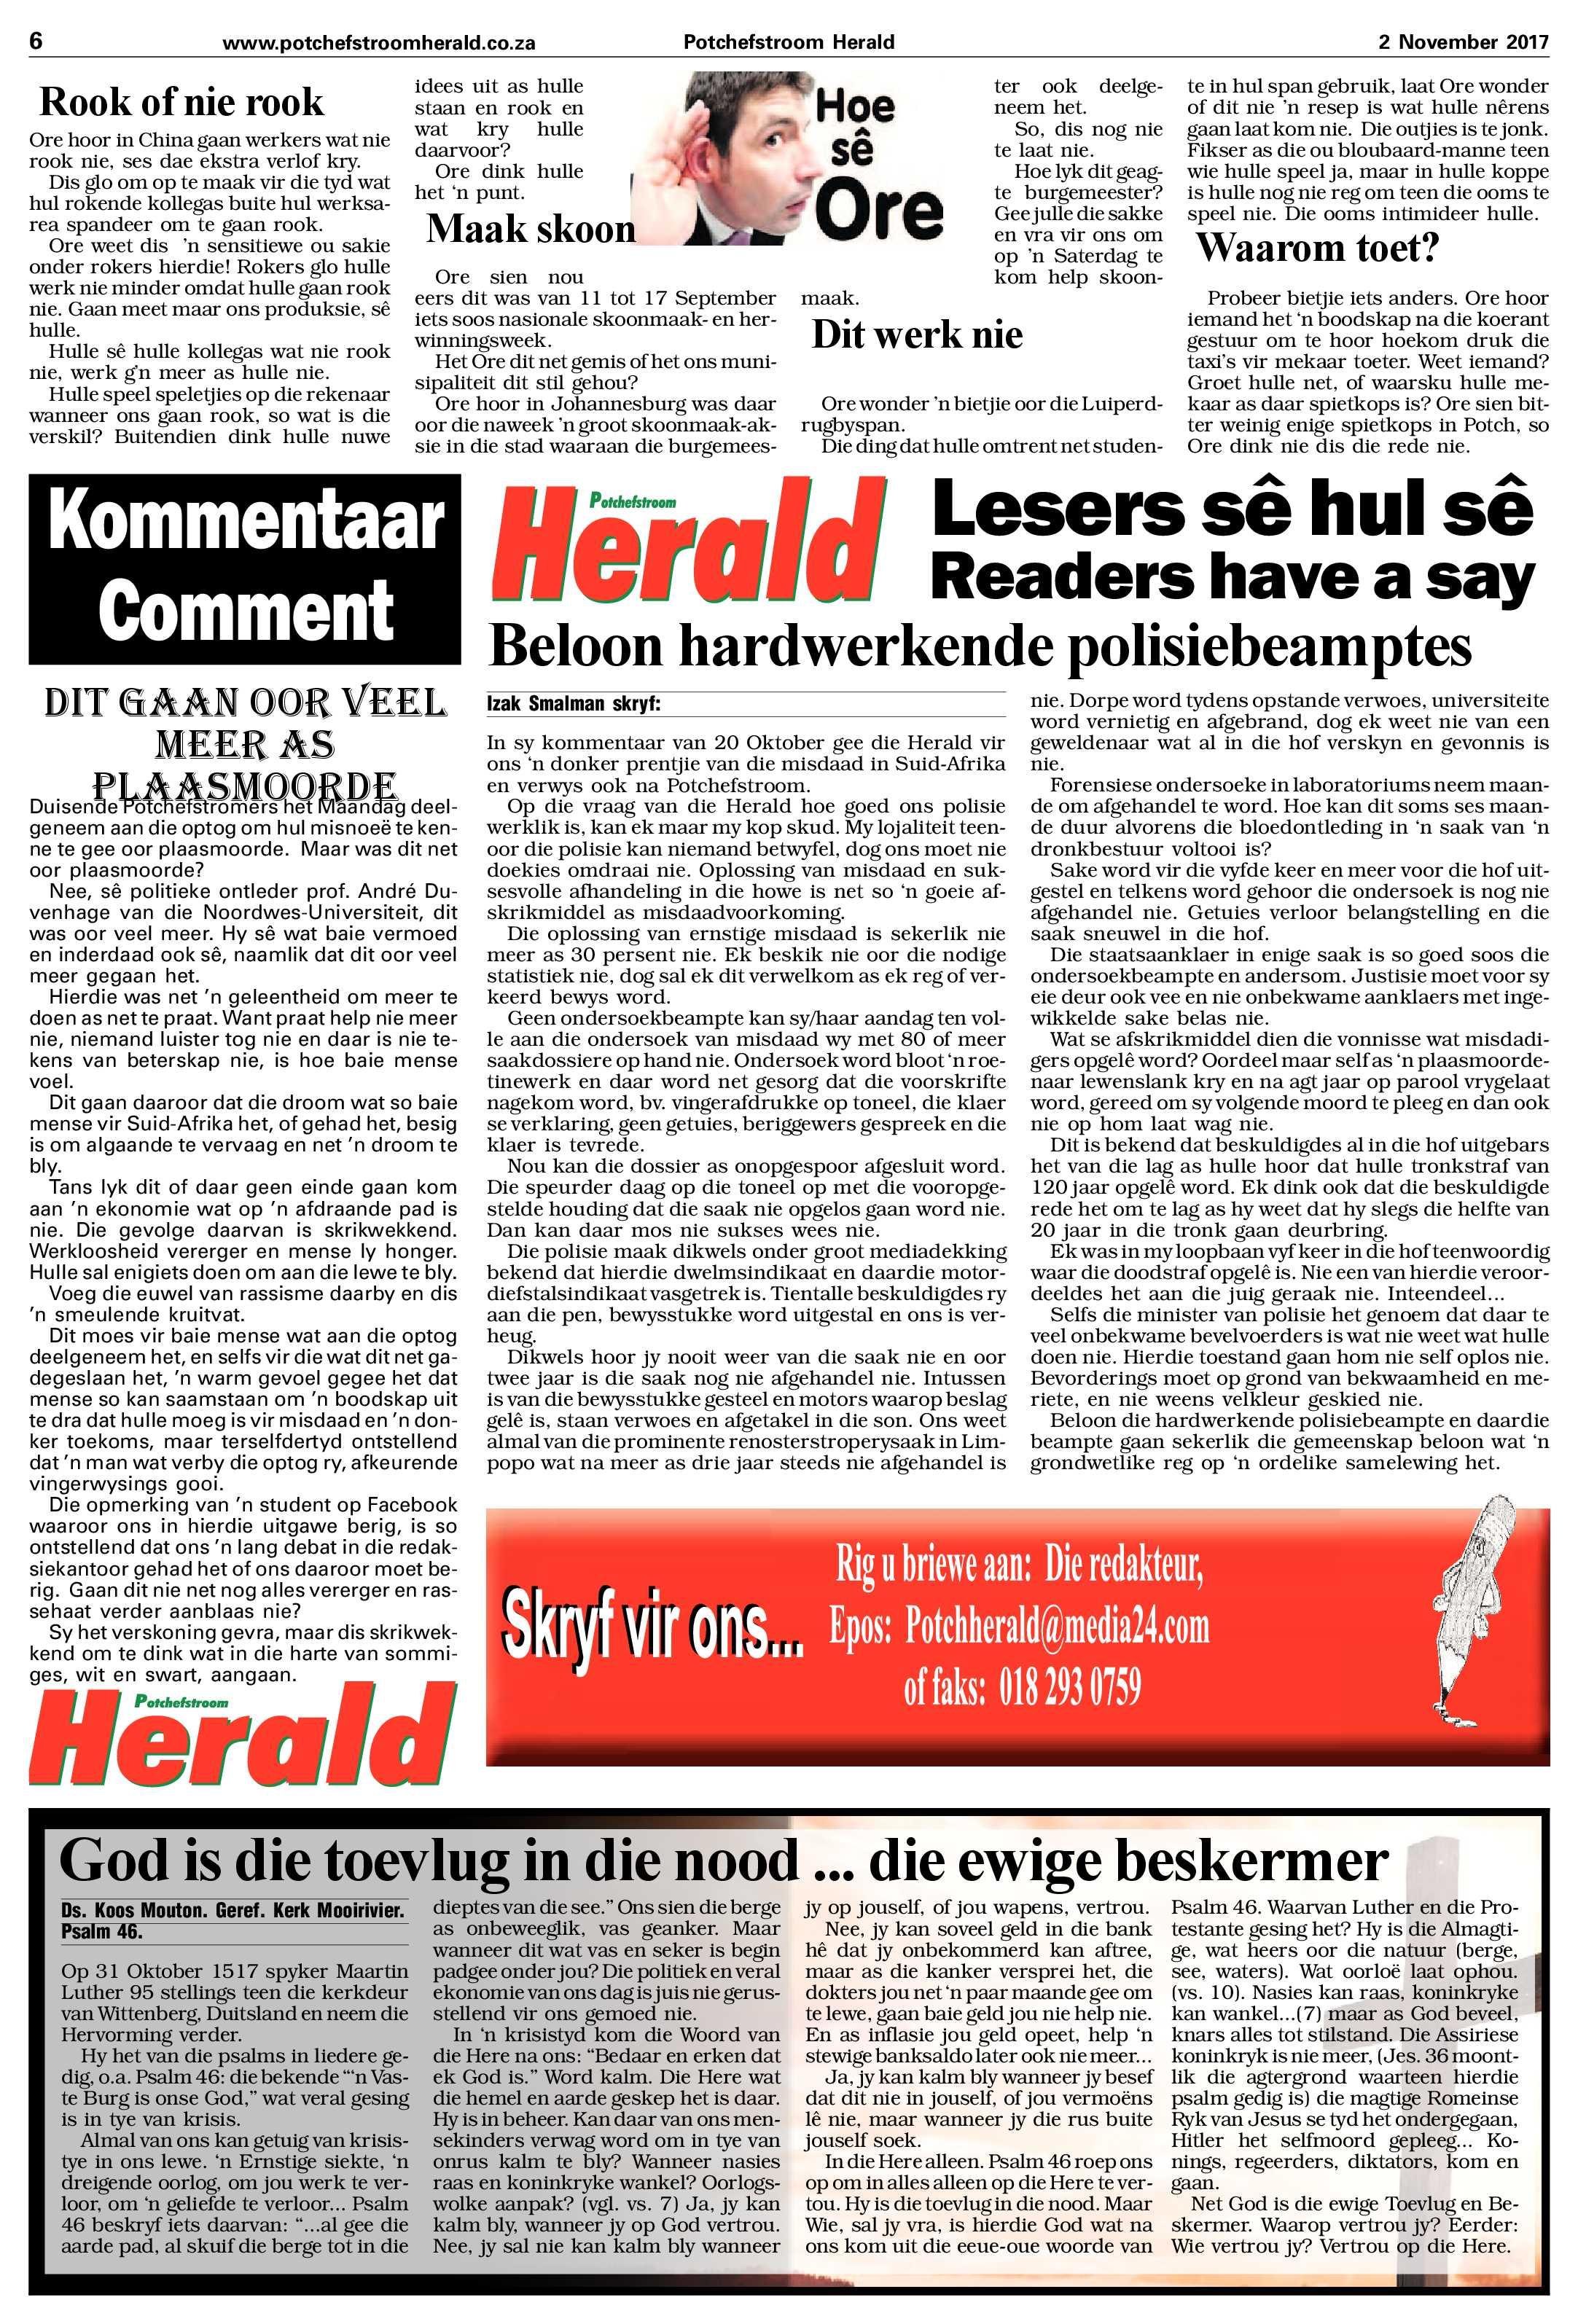 2-november-2017-epapers-page-6